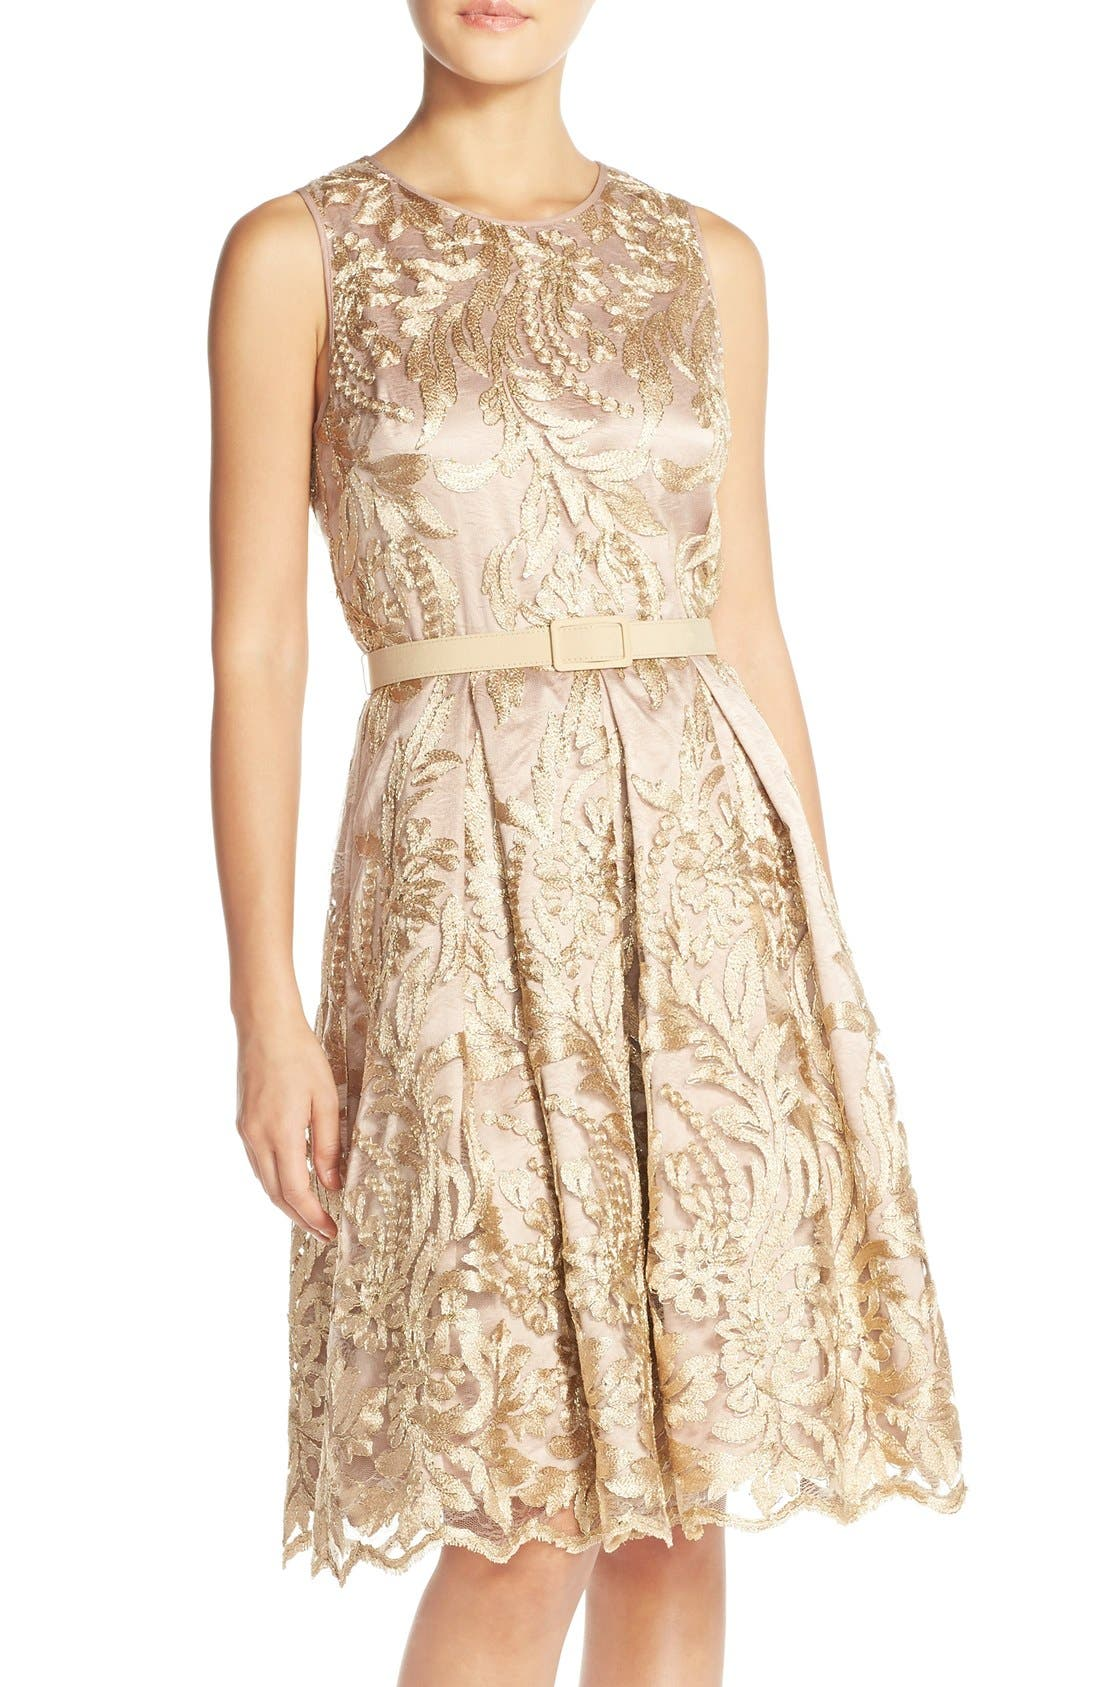 Alternate Image 1 Selected - Eliza J Belted Embroidered Charmeuse Fit & Flare Dress